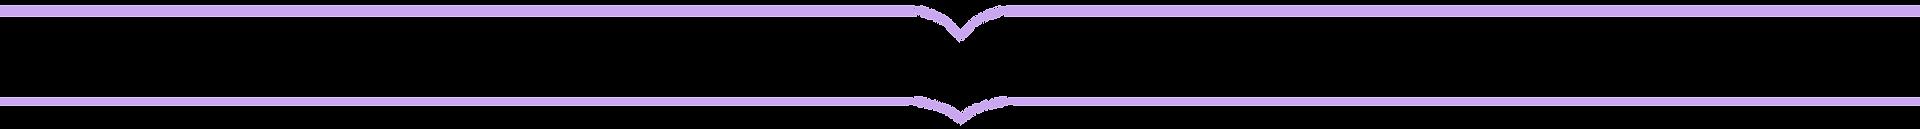 livro1.png